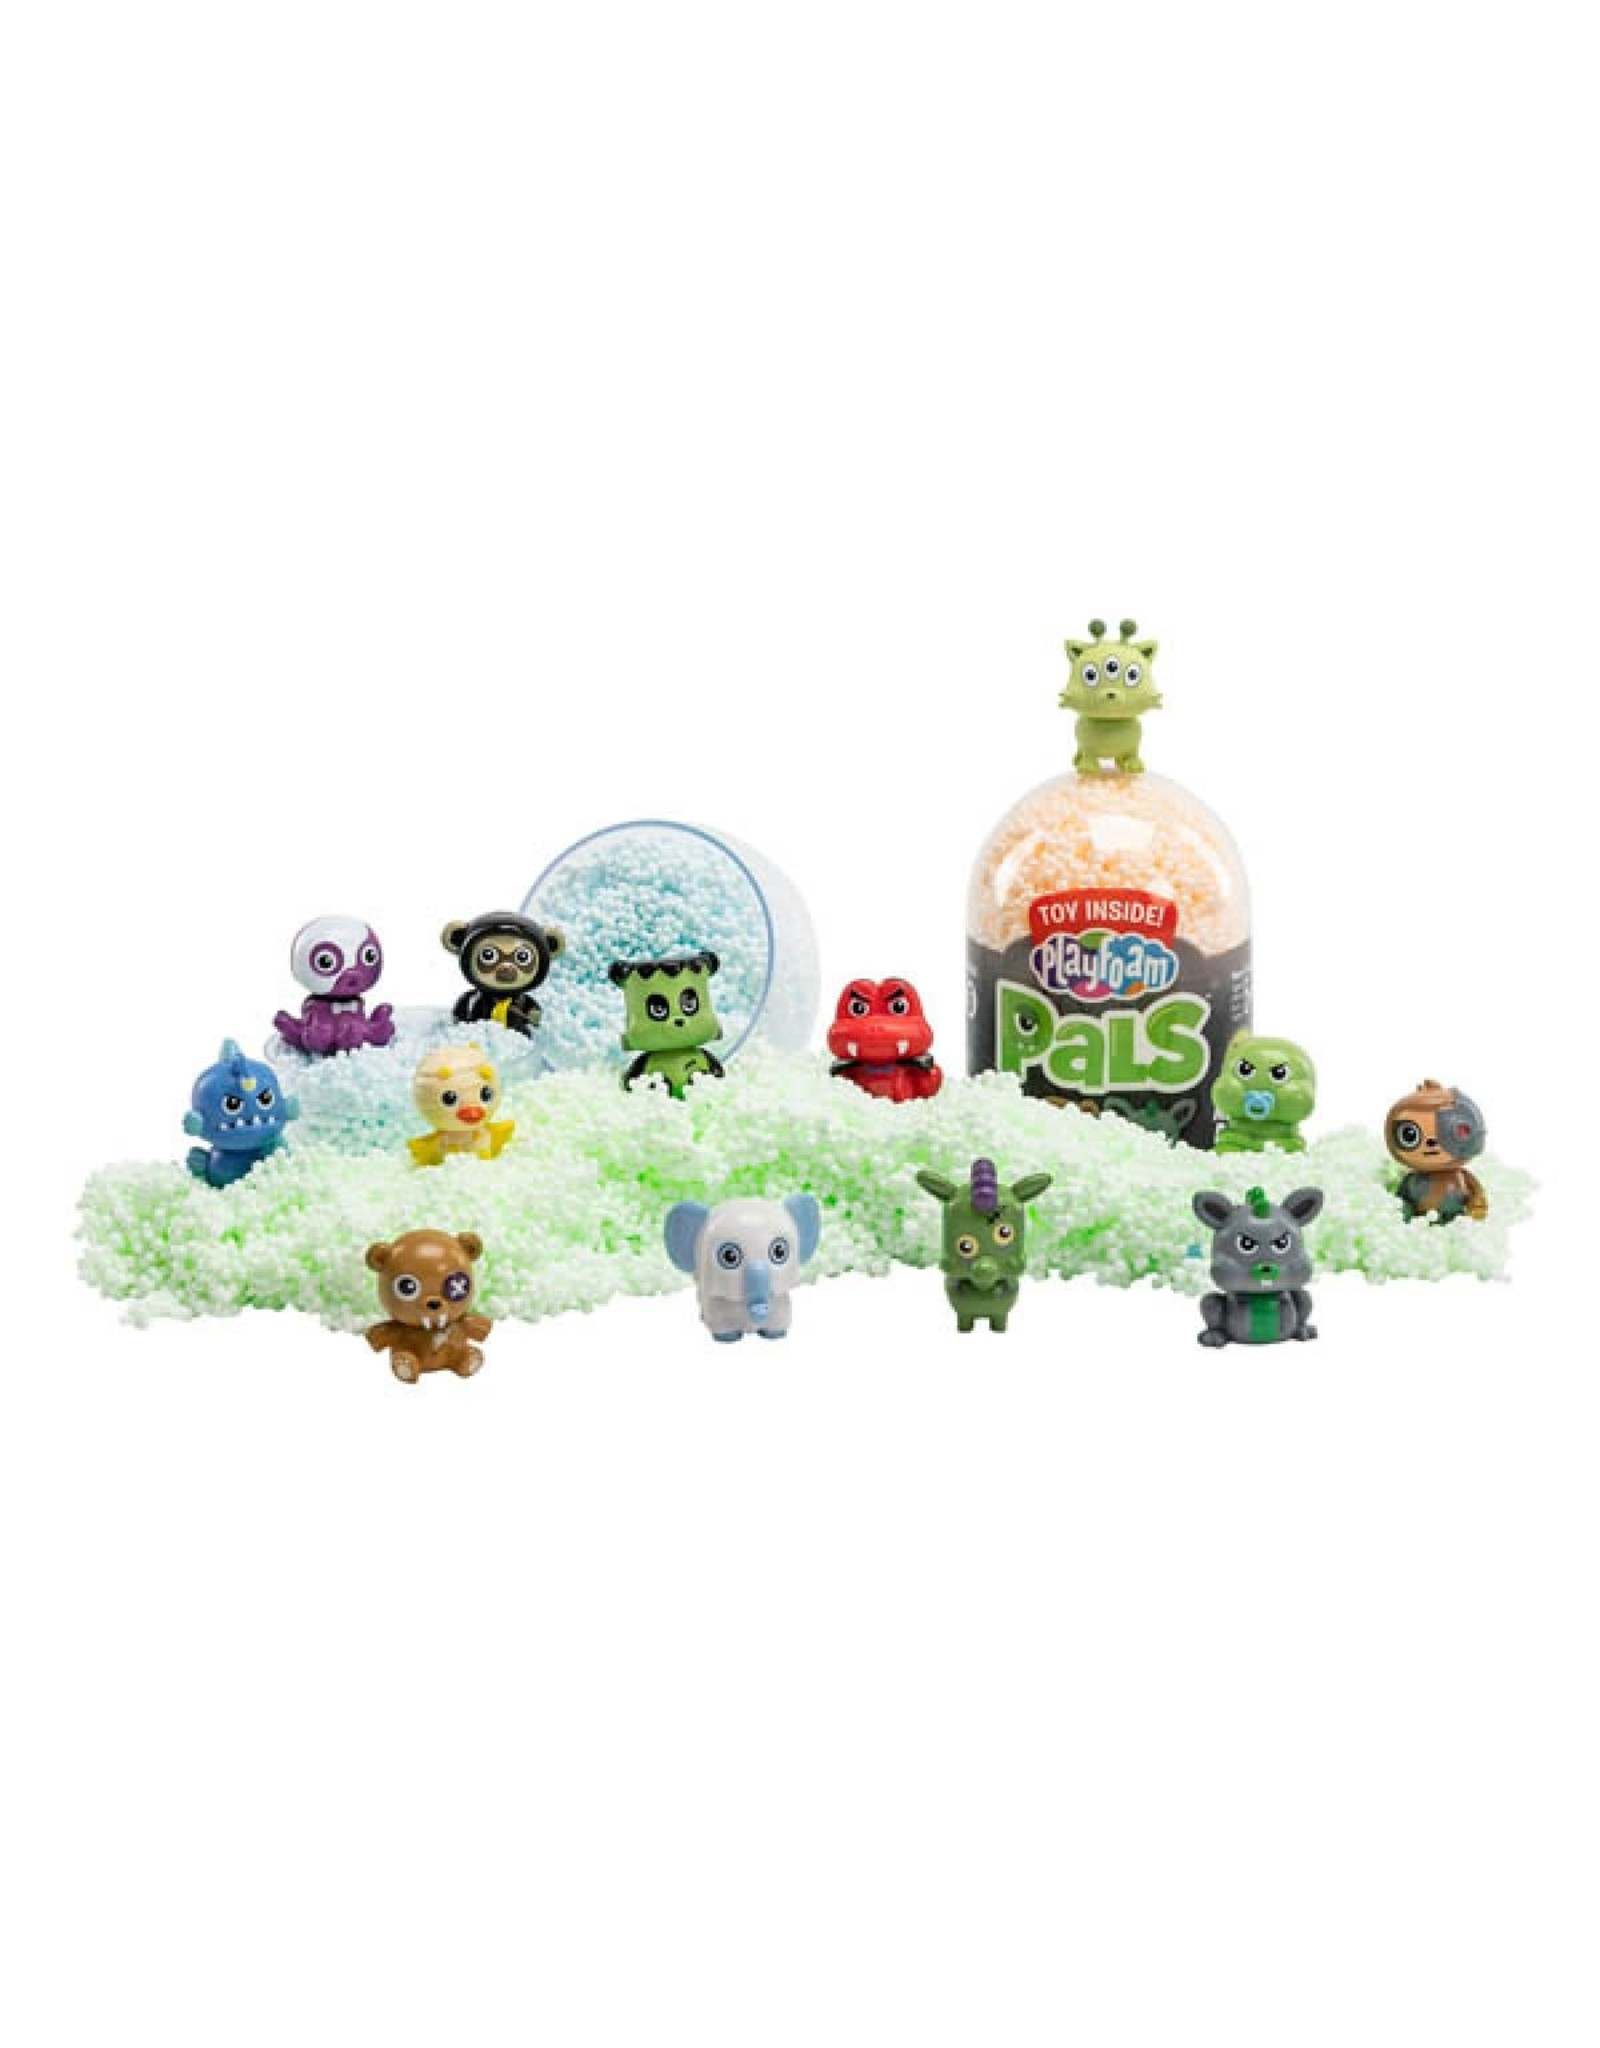 Playfoam Pals - Monster Party